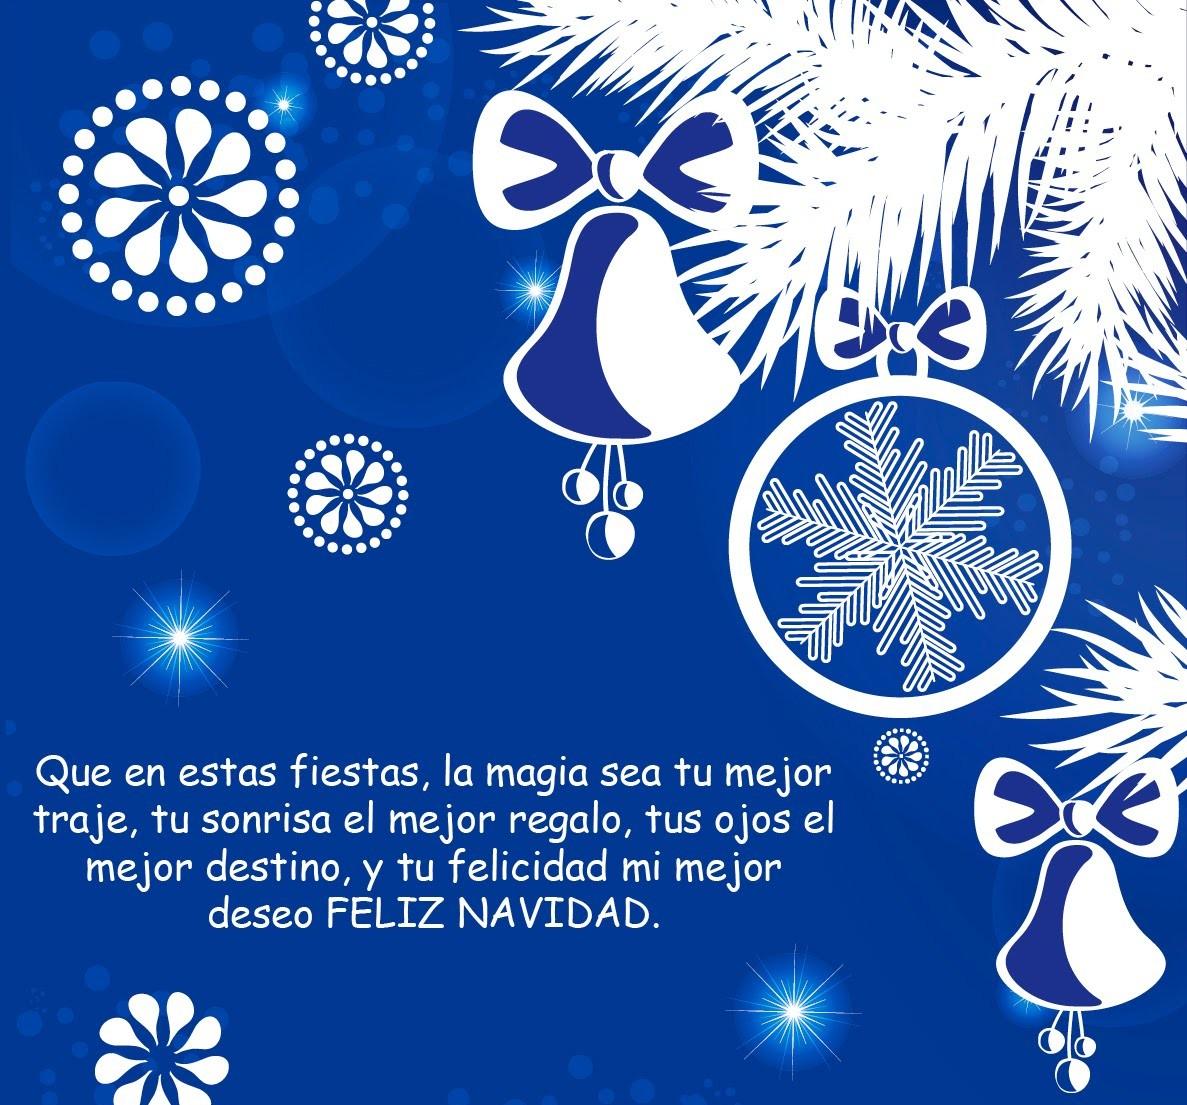 Frases cortas bonitas frases navide as - Citas navidenas celebres ...